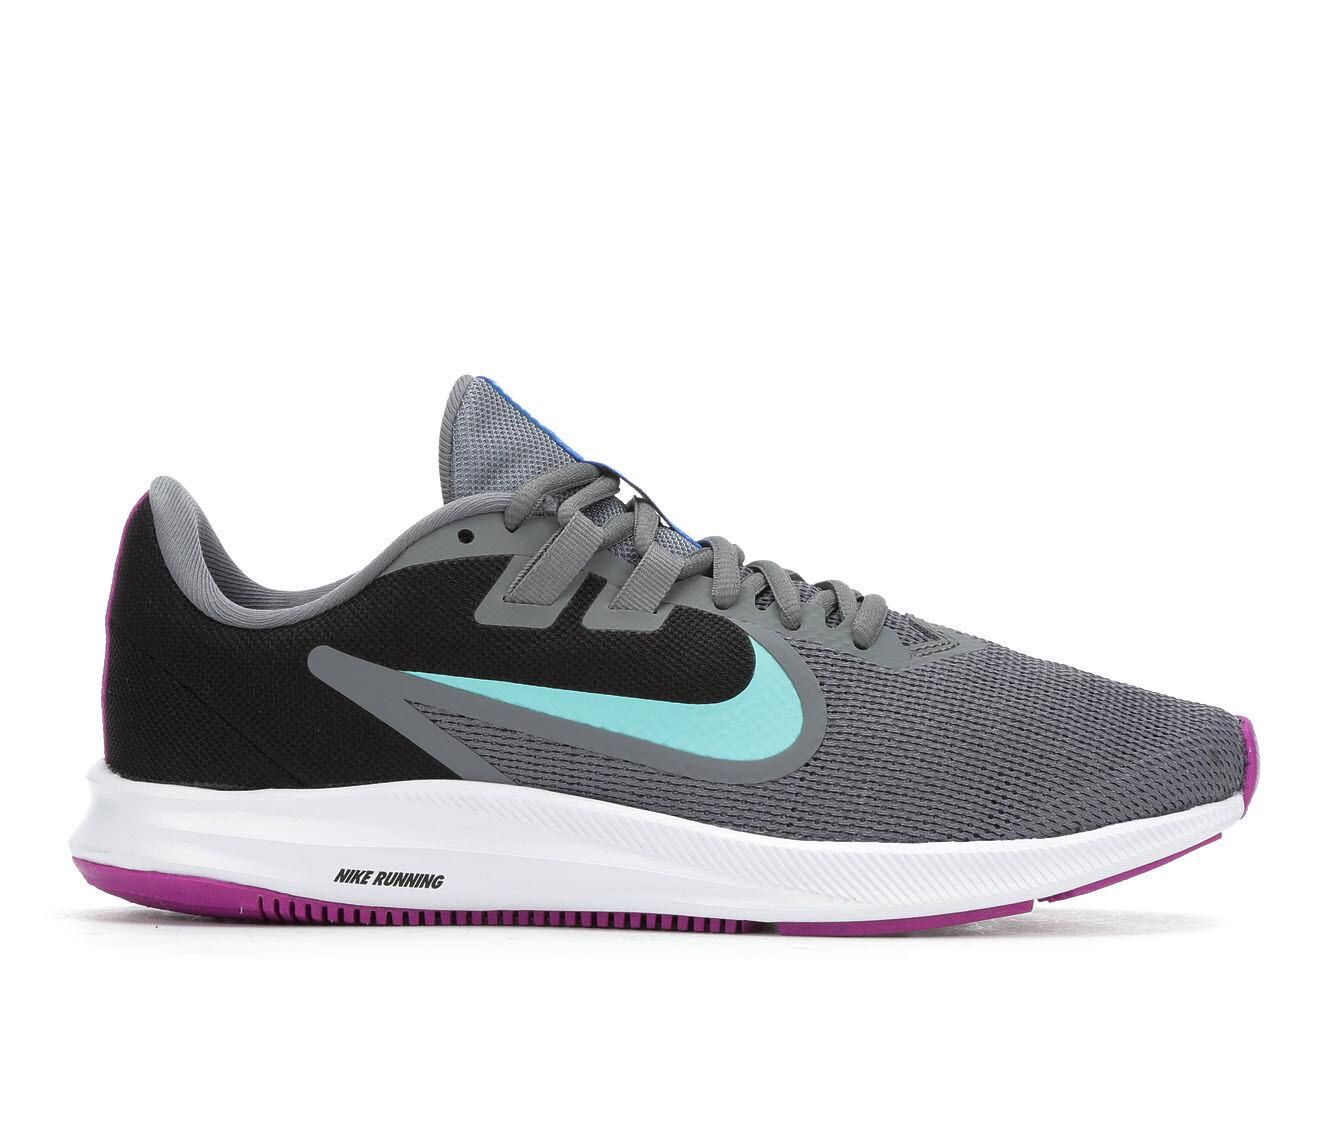 uk shoes_kd4548